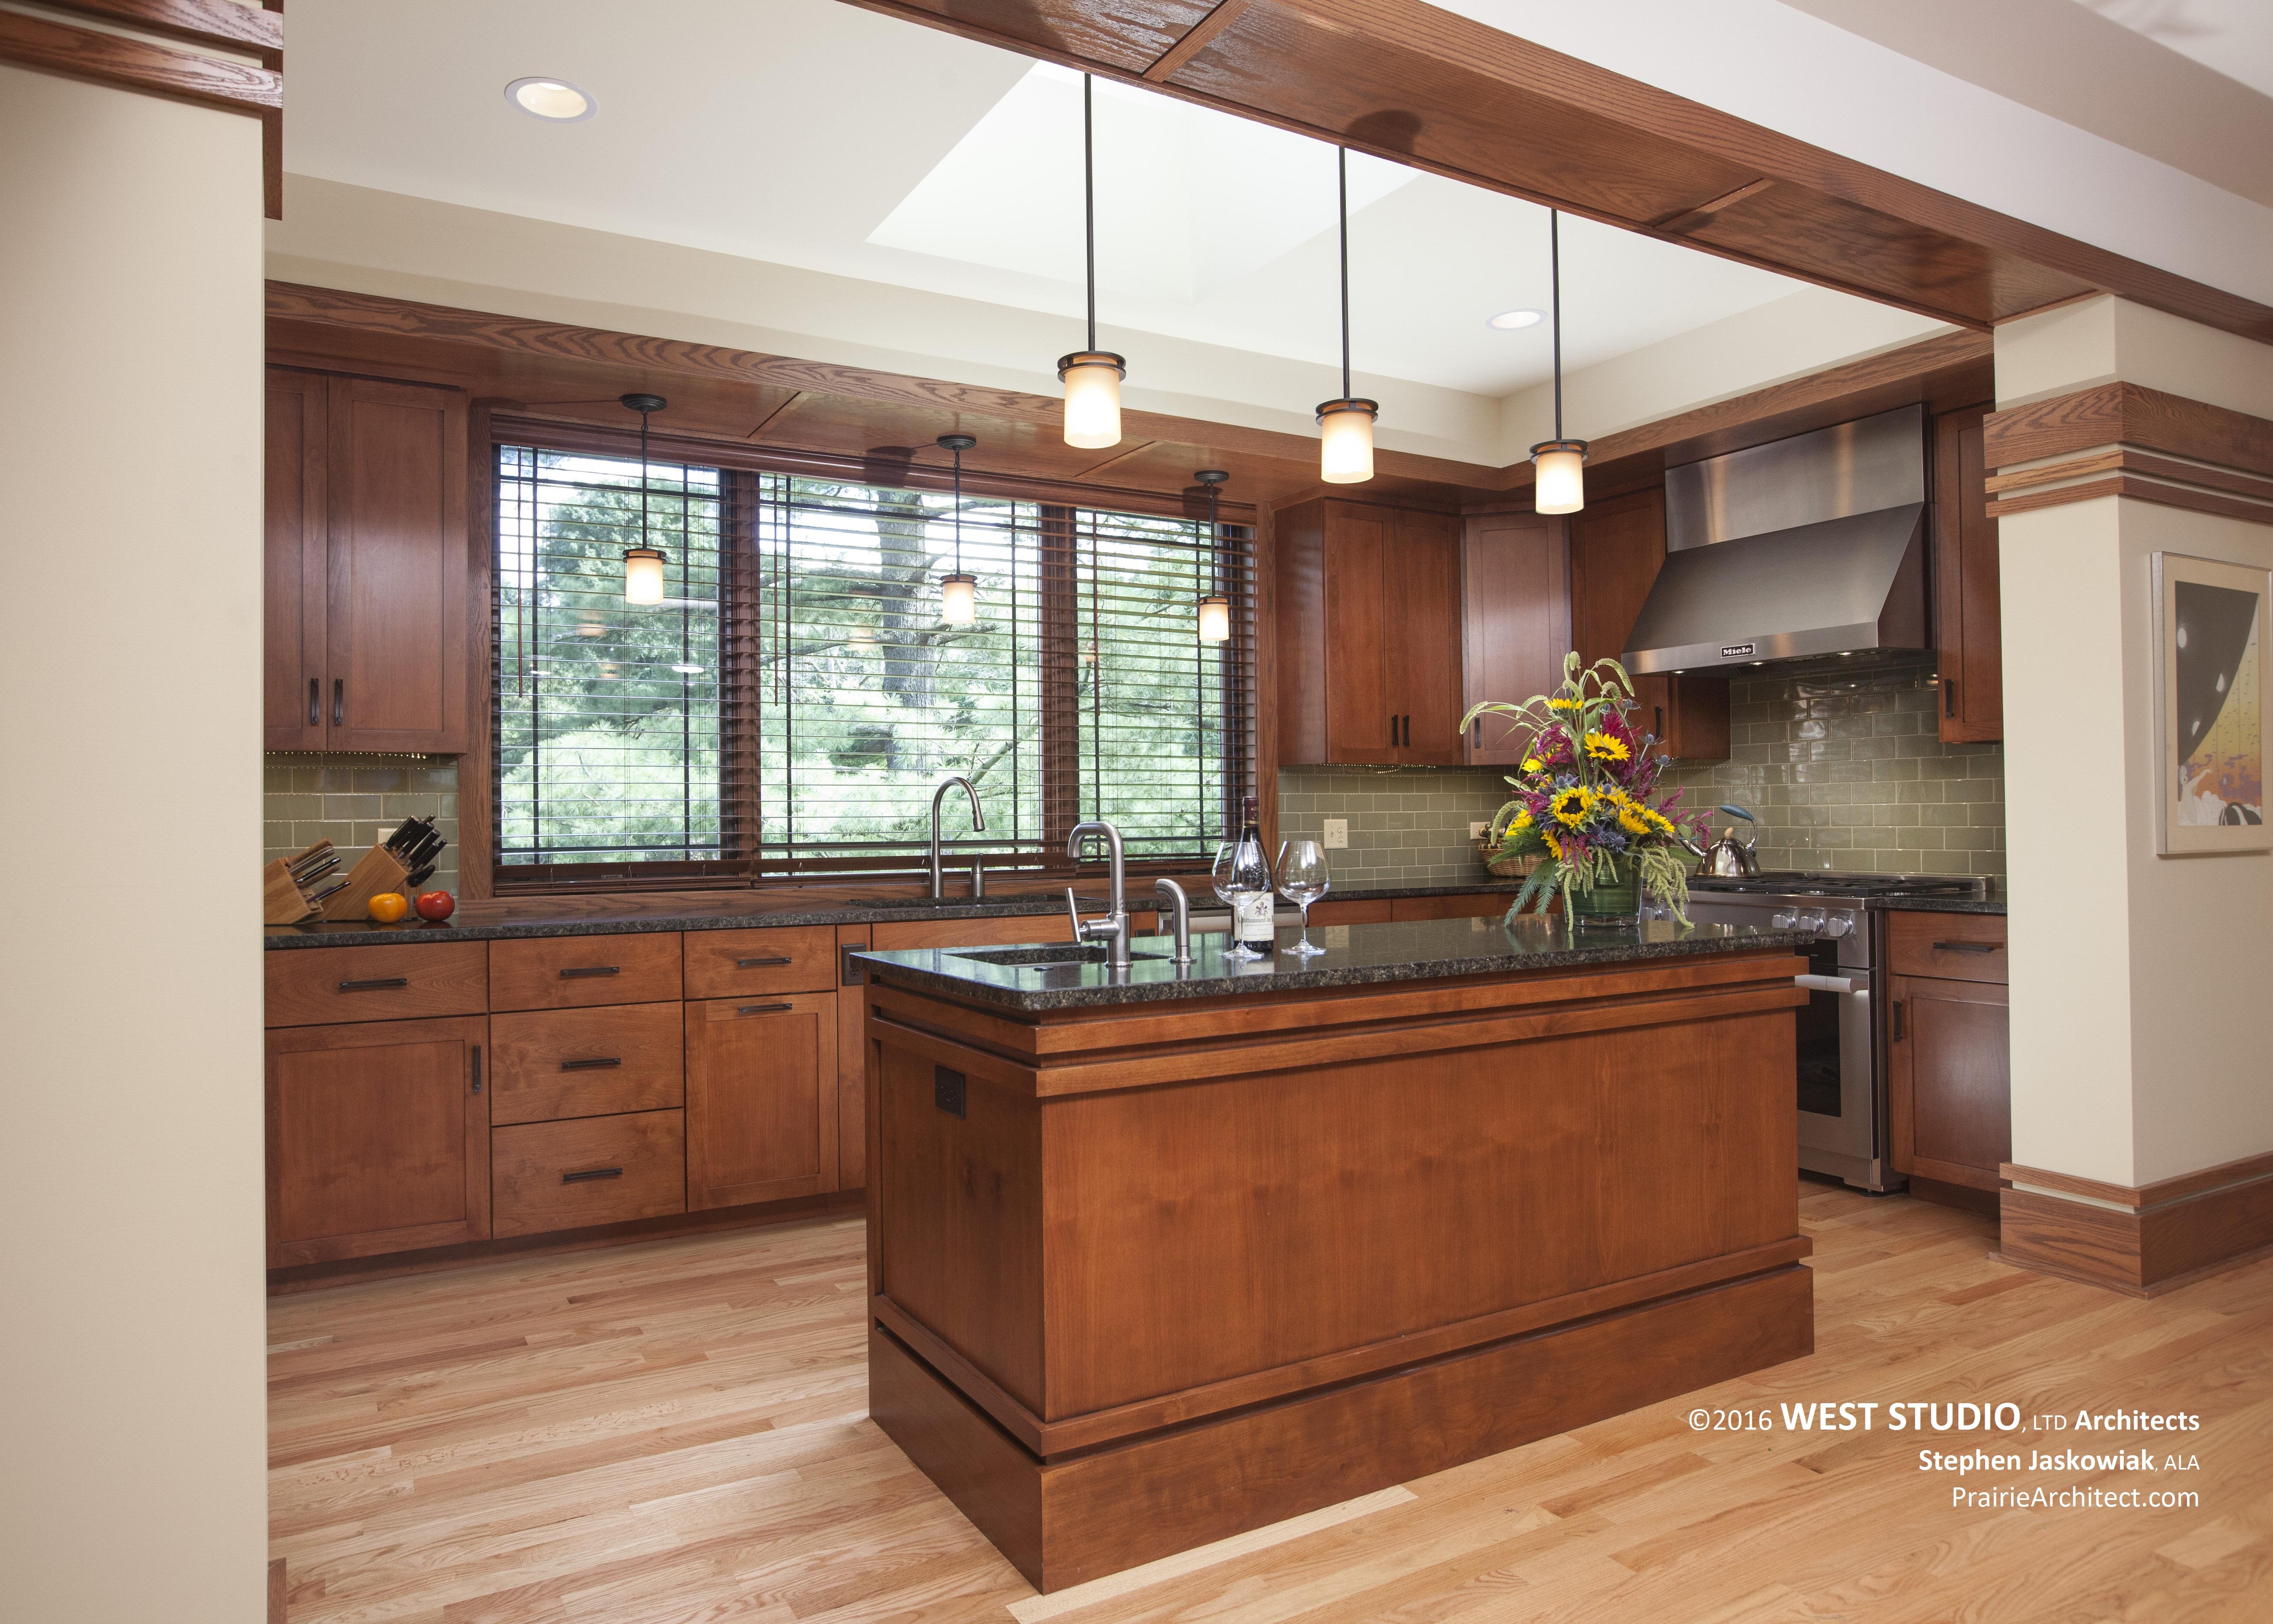 Harmonic Winds House Kitchen. Prairie Style Kitchen, West Studio  Architects, Frank Lloyd Wright Inspired